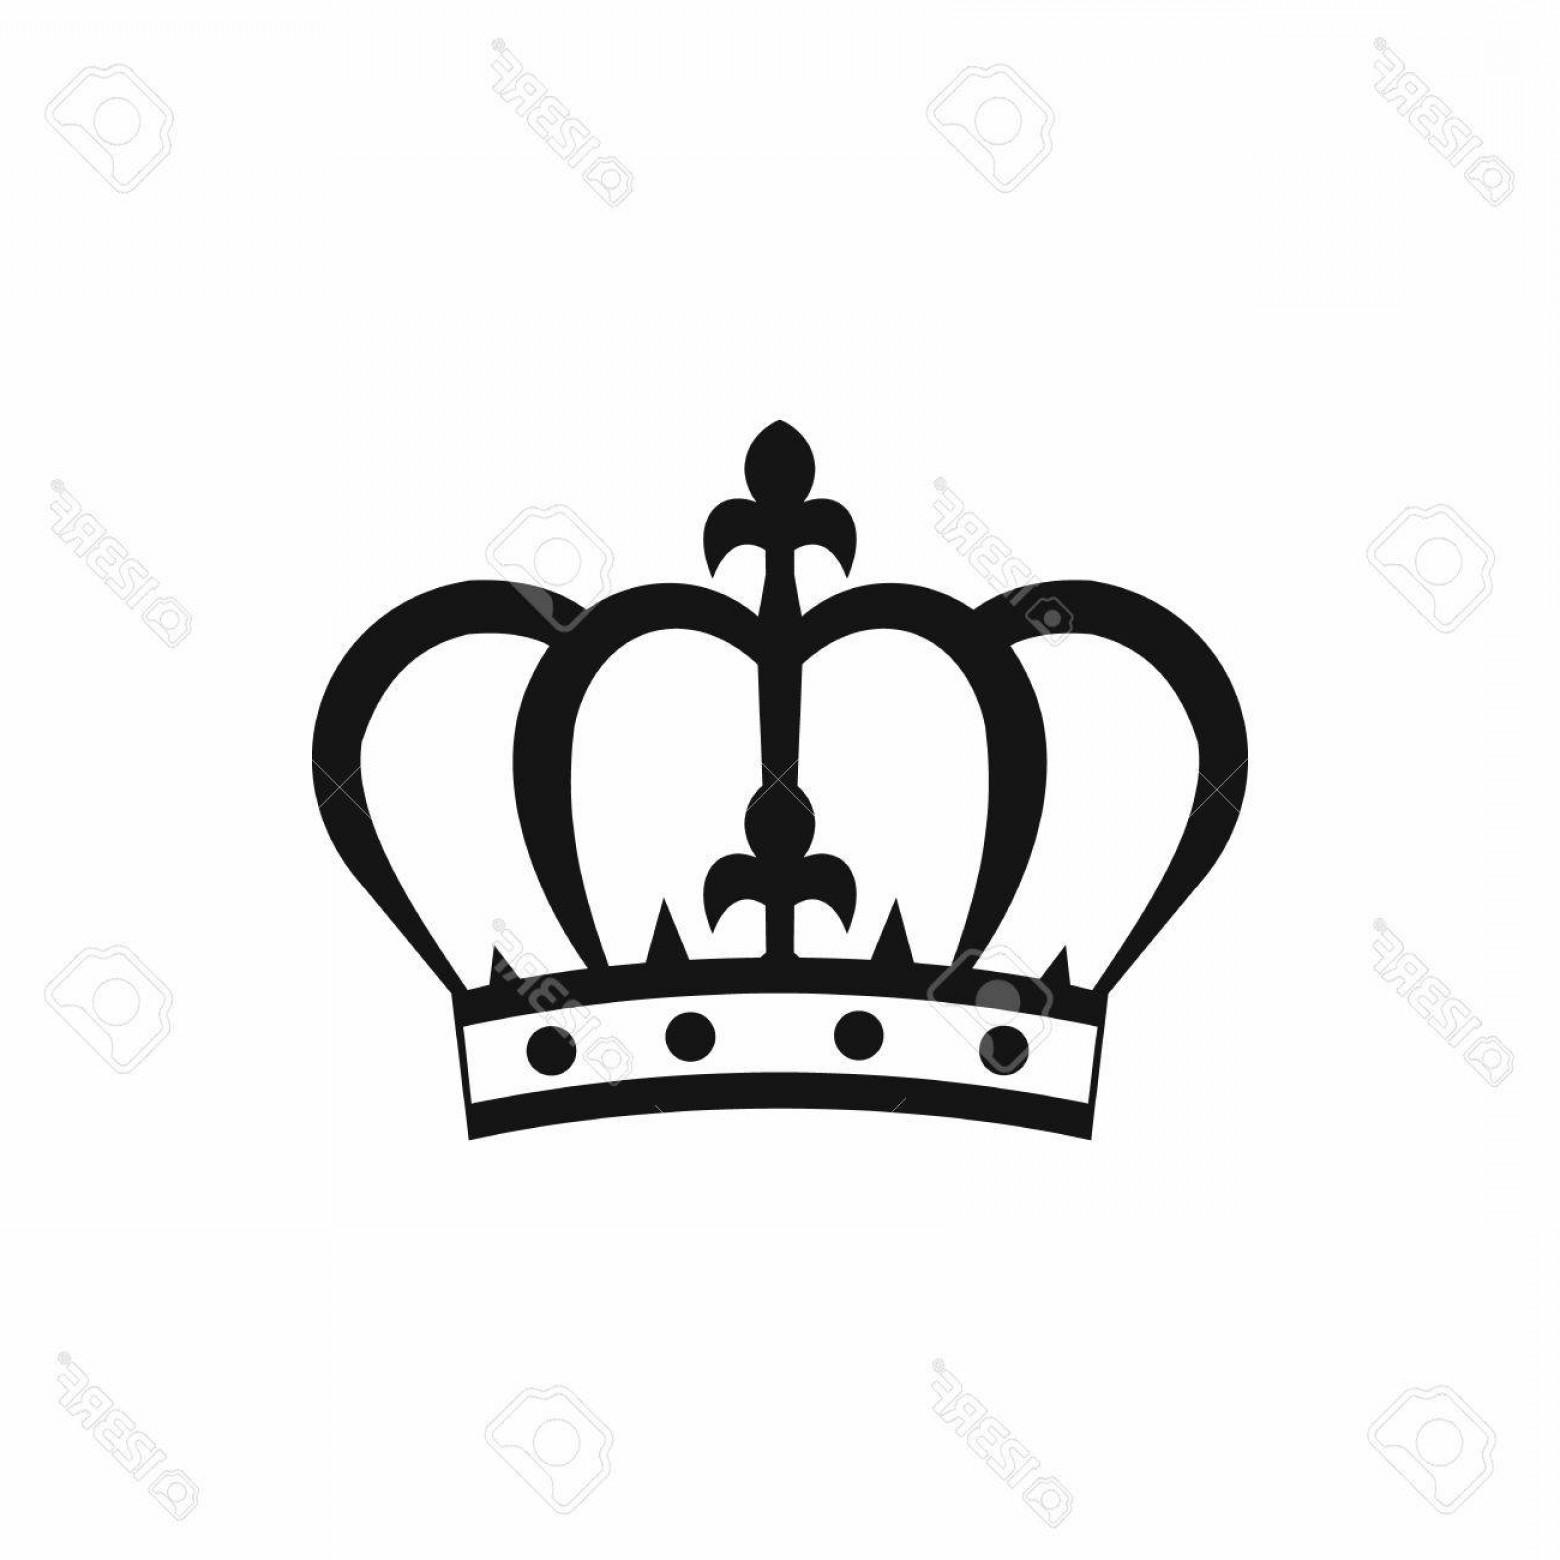 1560x1560 Simple Queen Crown Silhouette Vector Lazttweet